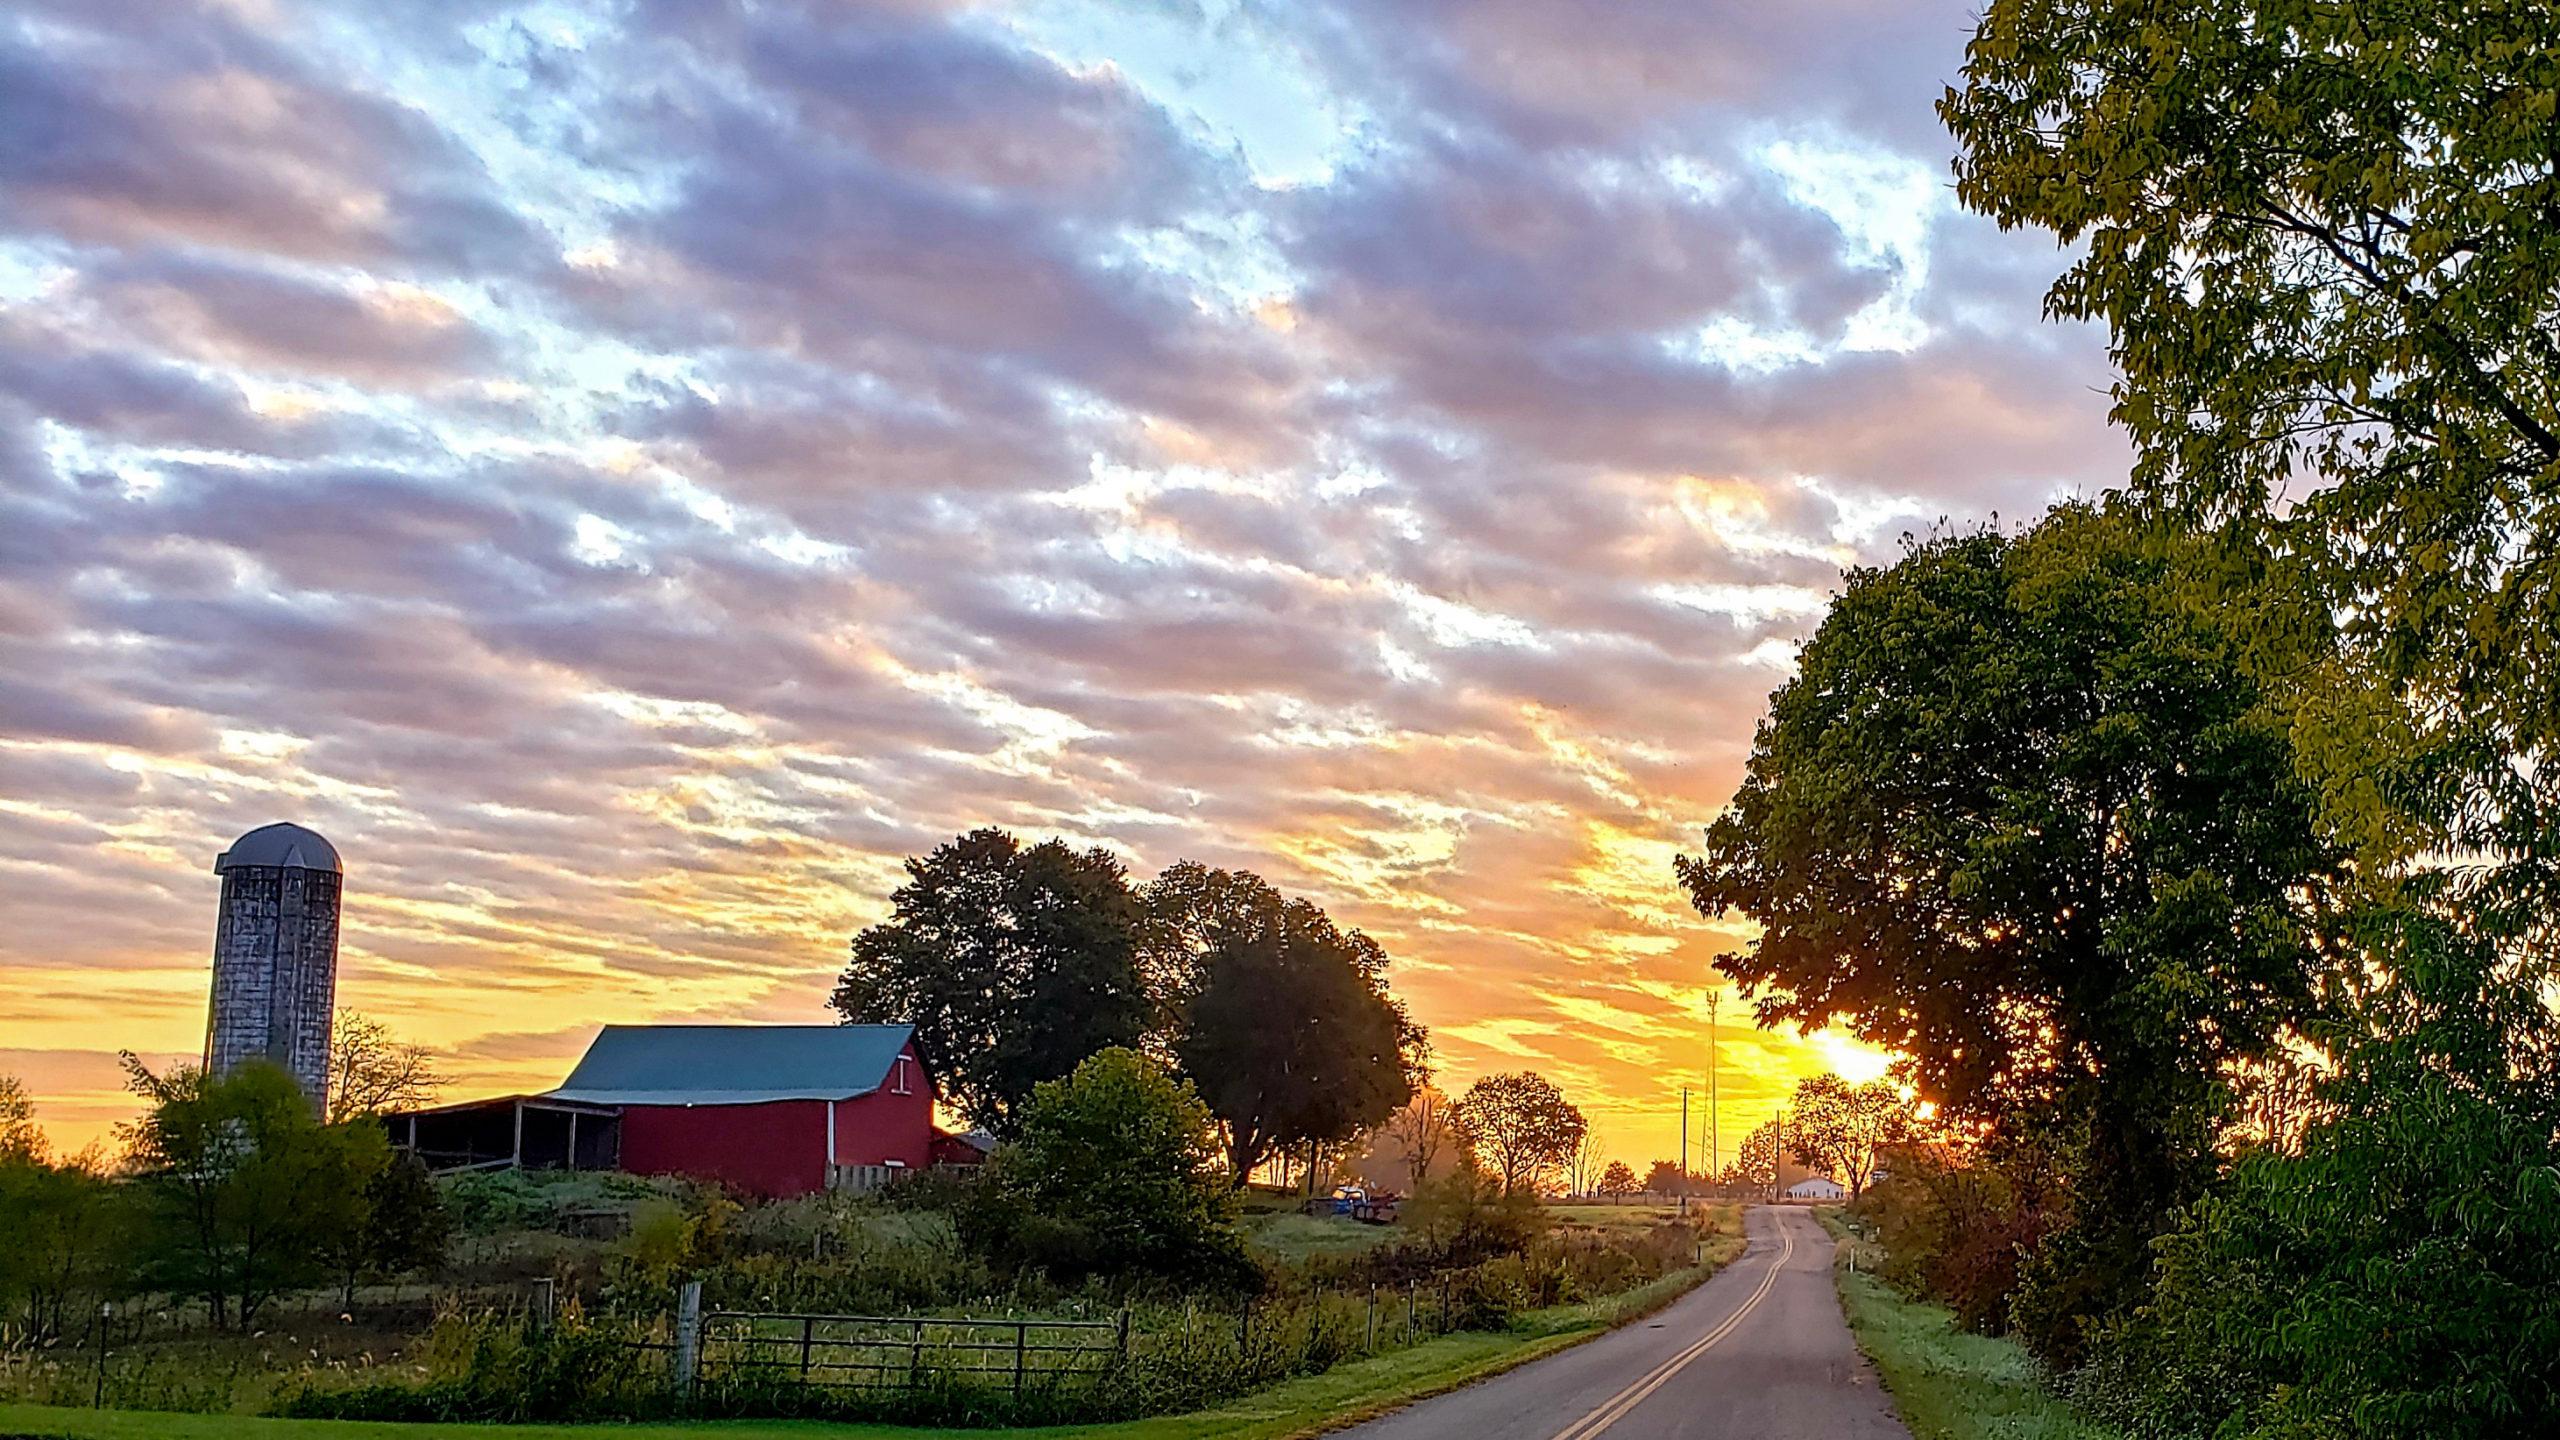 October sunrise on the farm